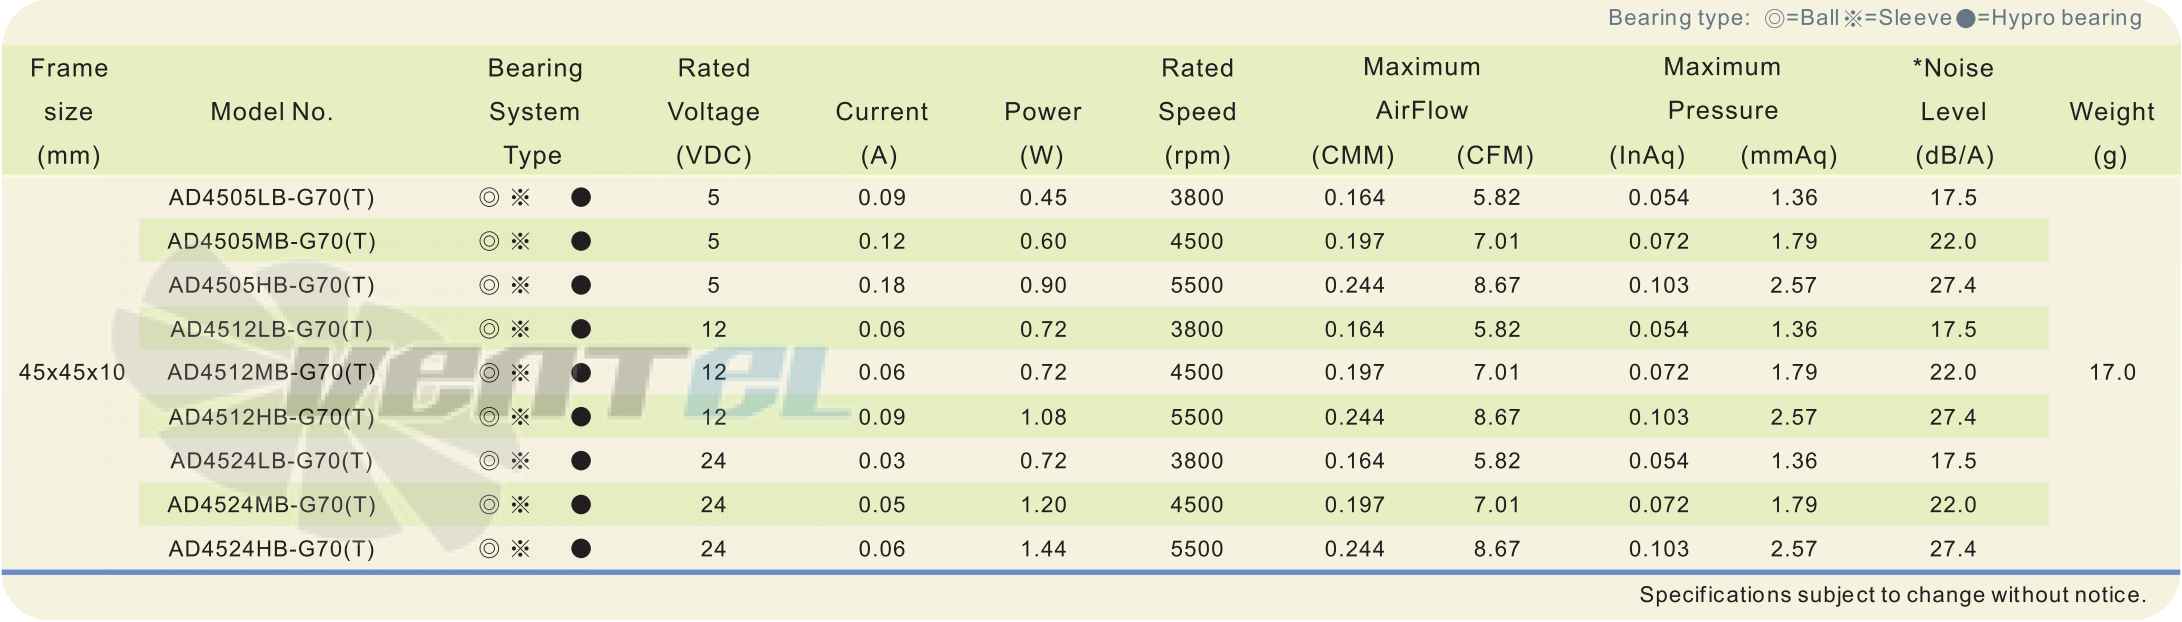 Рабочие параметры и характеристики ADDA AD4524MB-G70 45x45x10 DC